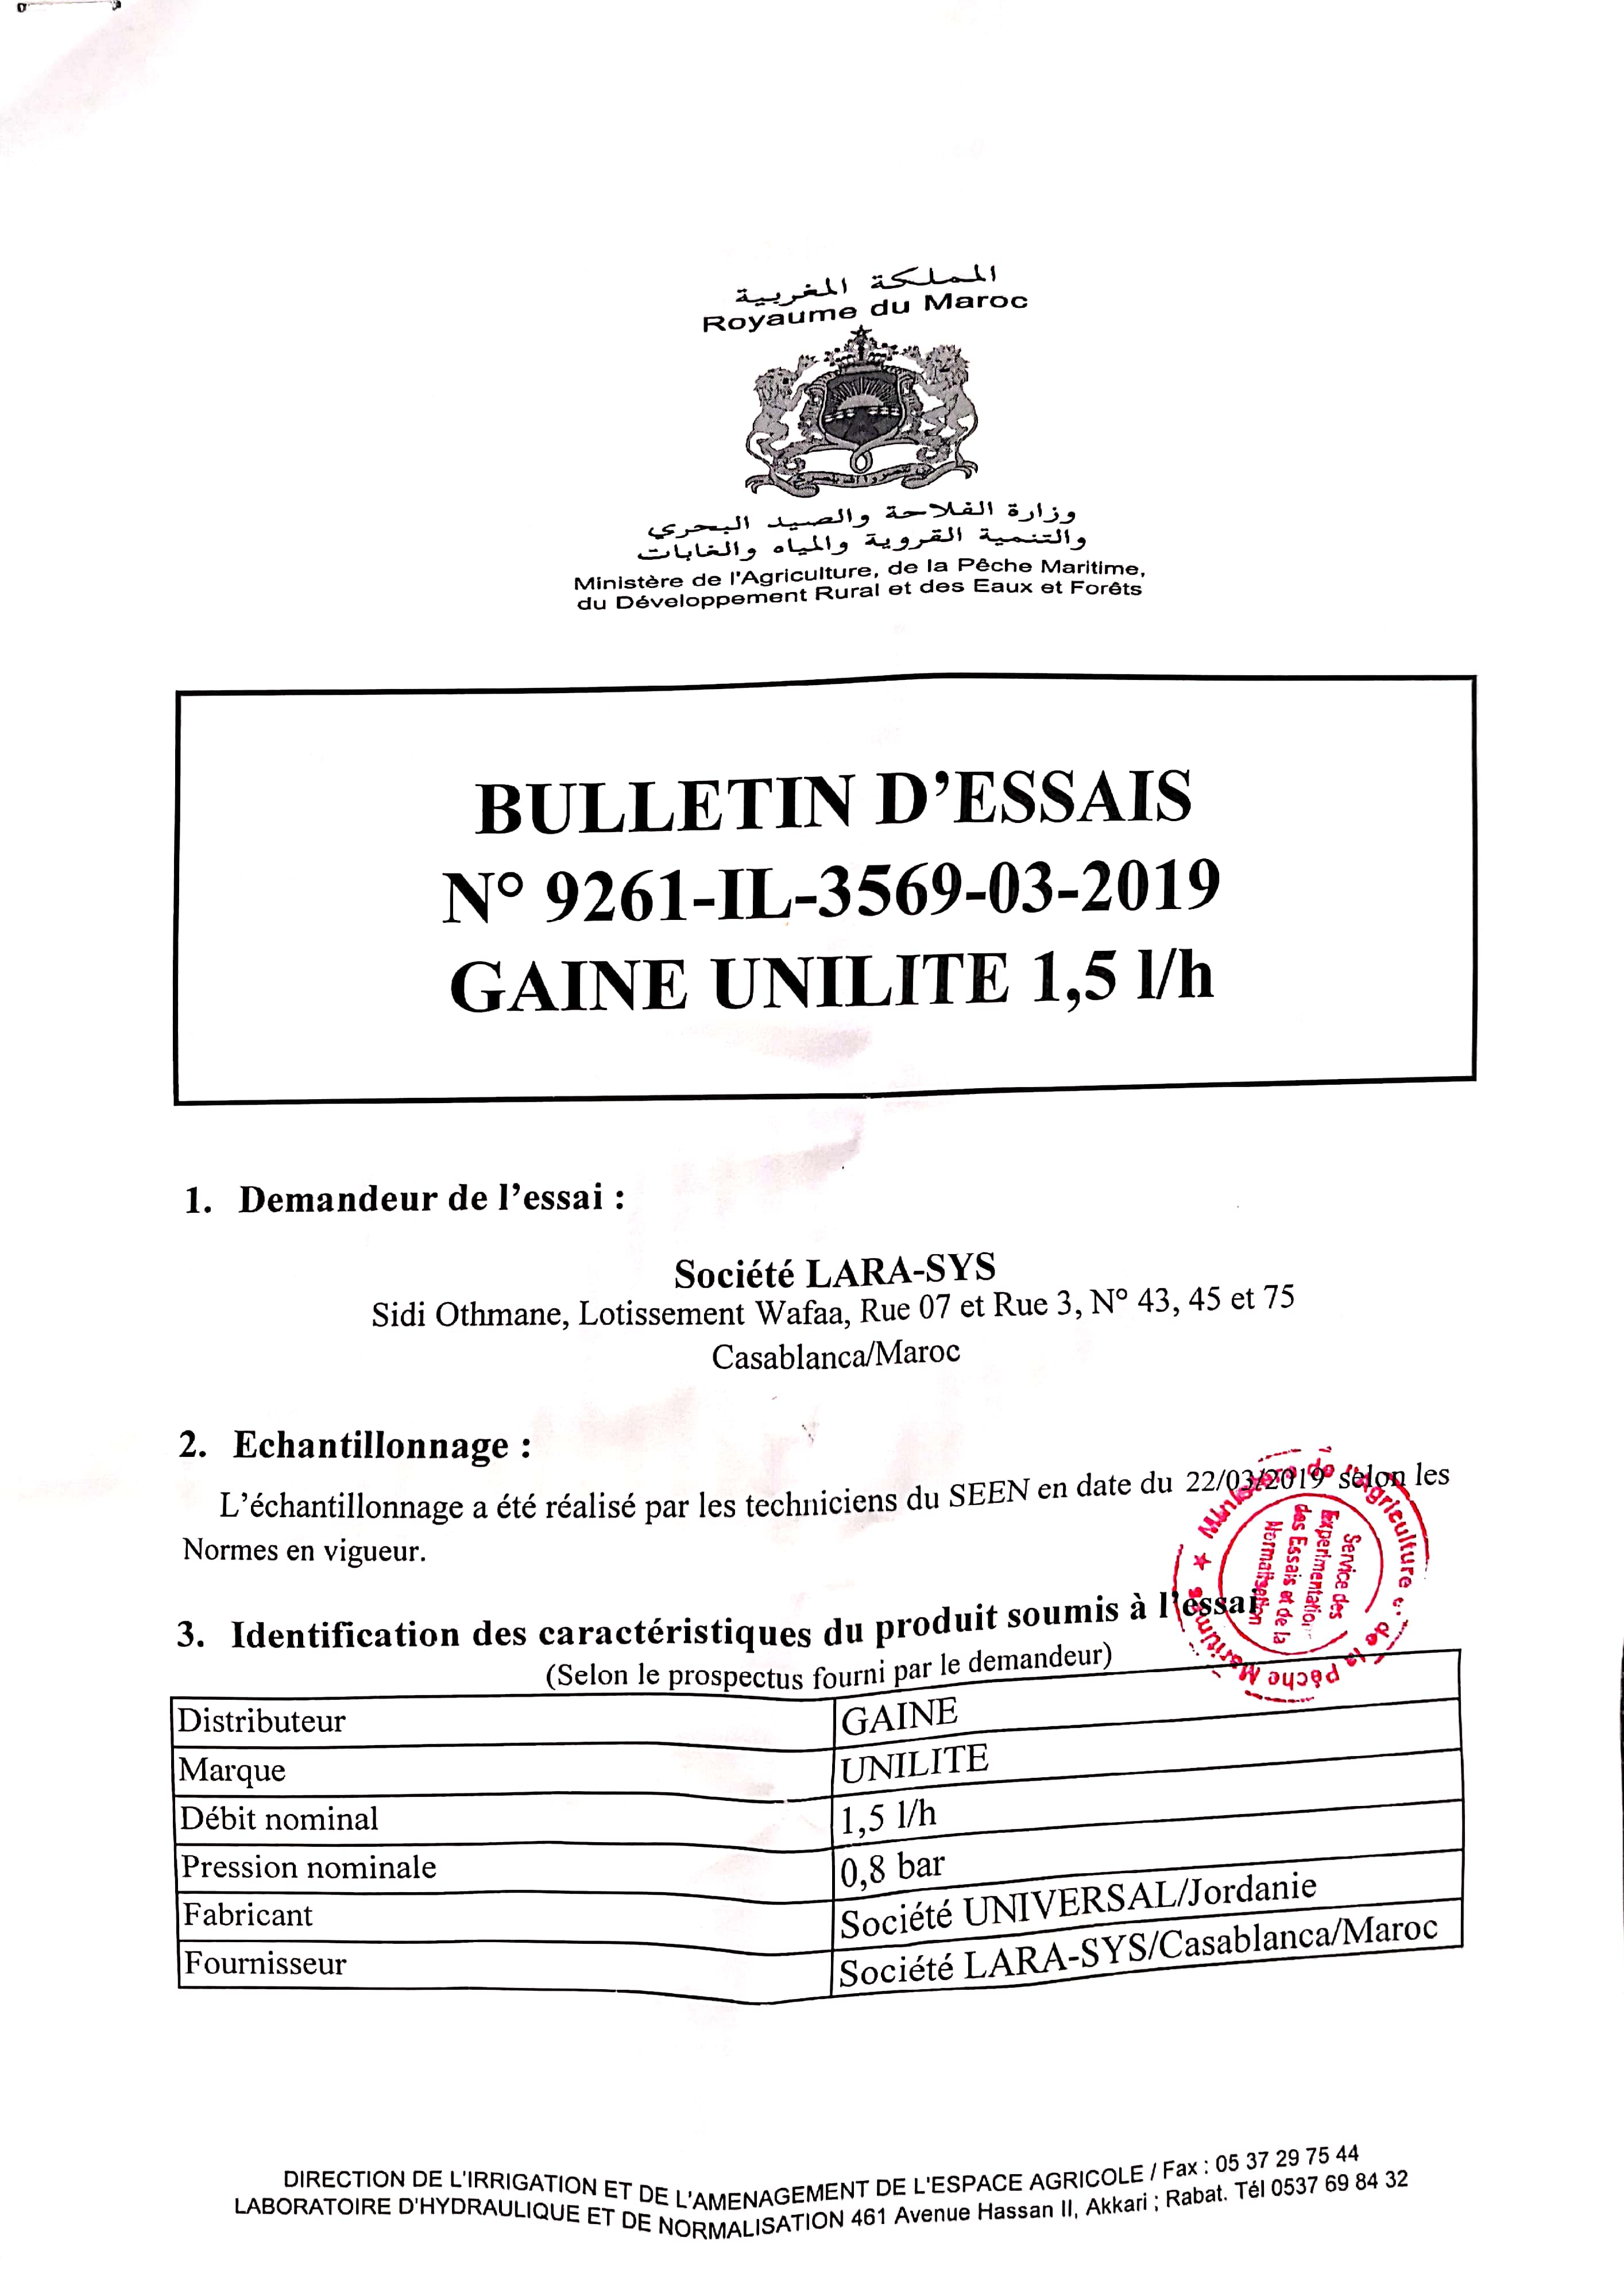 New Doc 2019-04-15 20.49.17_4